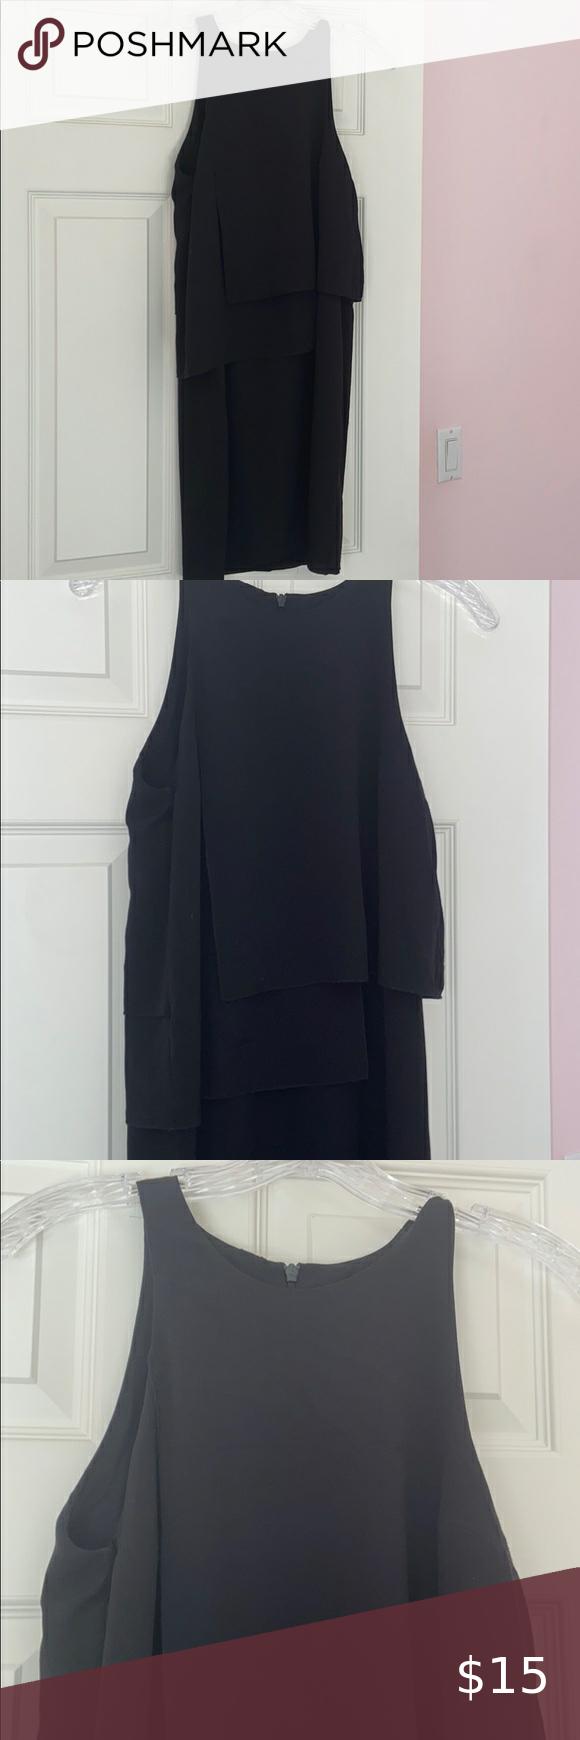 French Connection Black Dress French Connection Little Black Dress Zipper Back Asymmetrical Design Over T Dress Zipper French Connection Dress Clothes Design [ 1740 x 580 Pixel ]